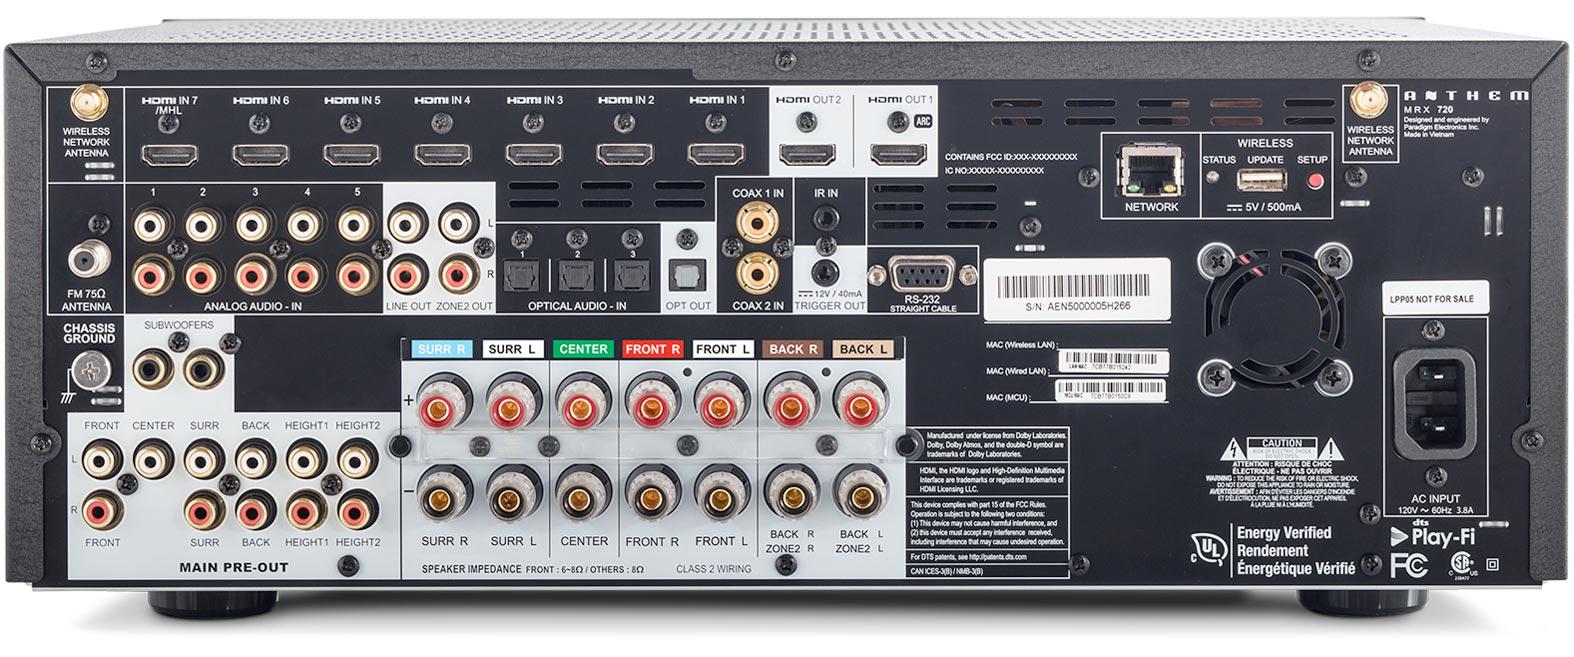 MRX 720 Rear Panel